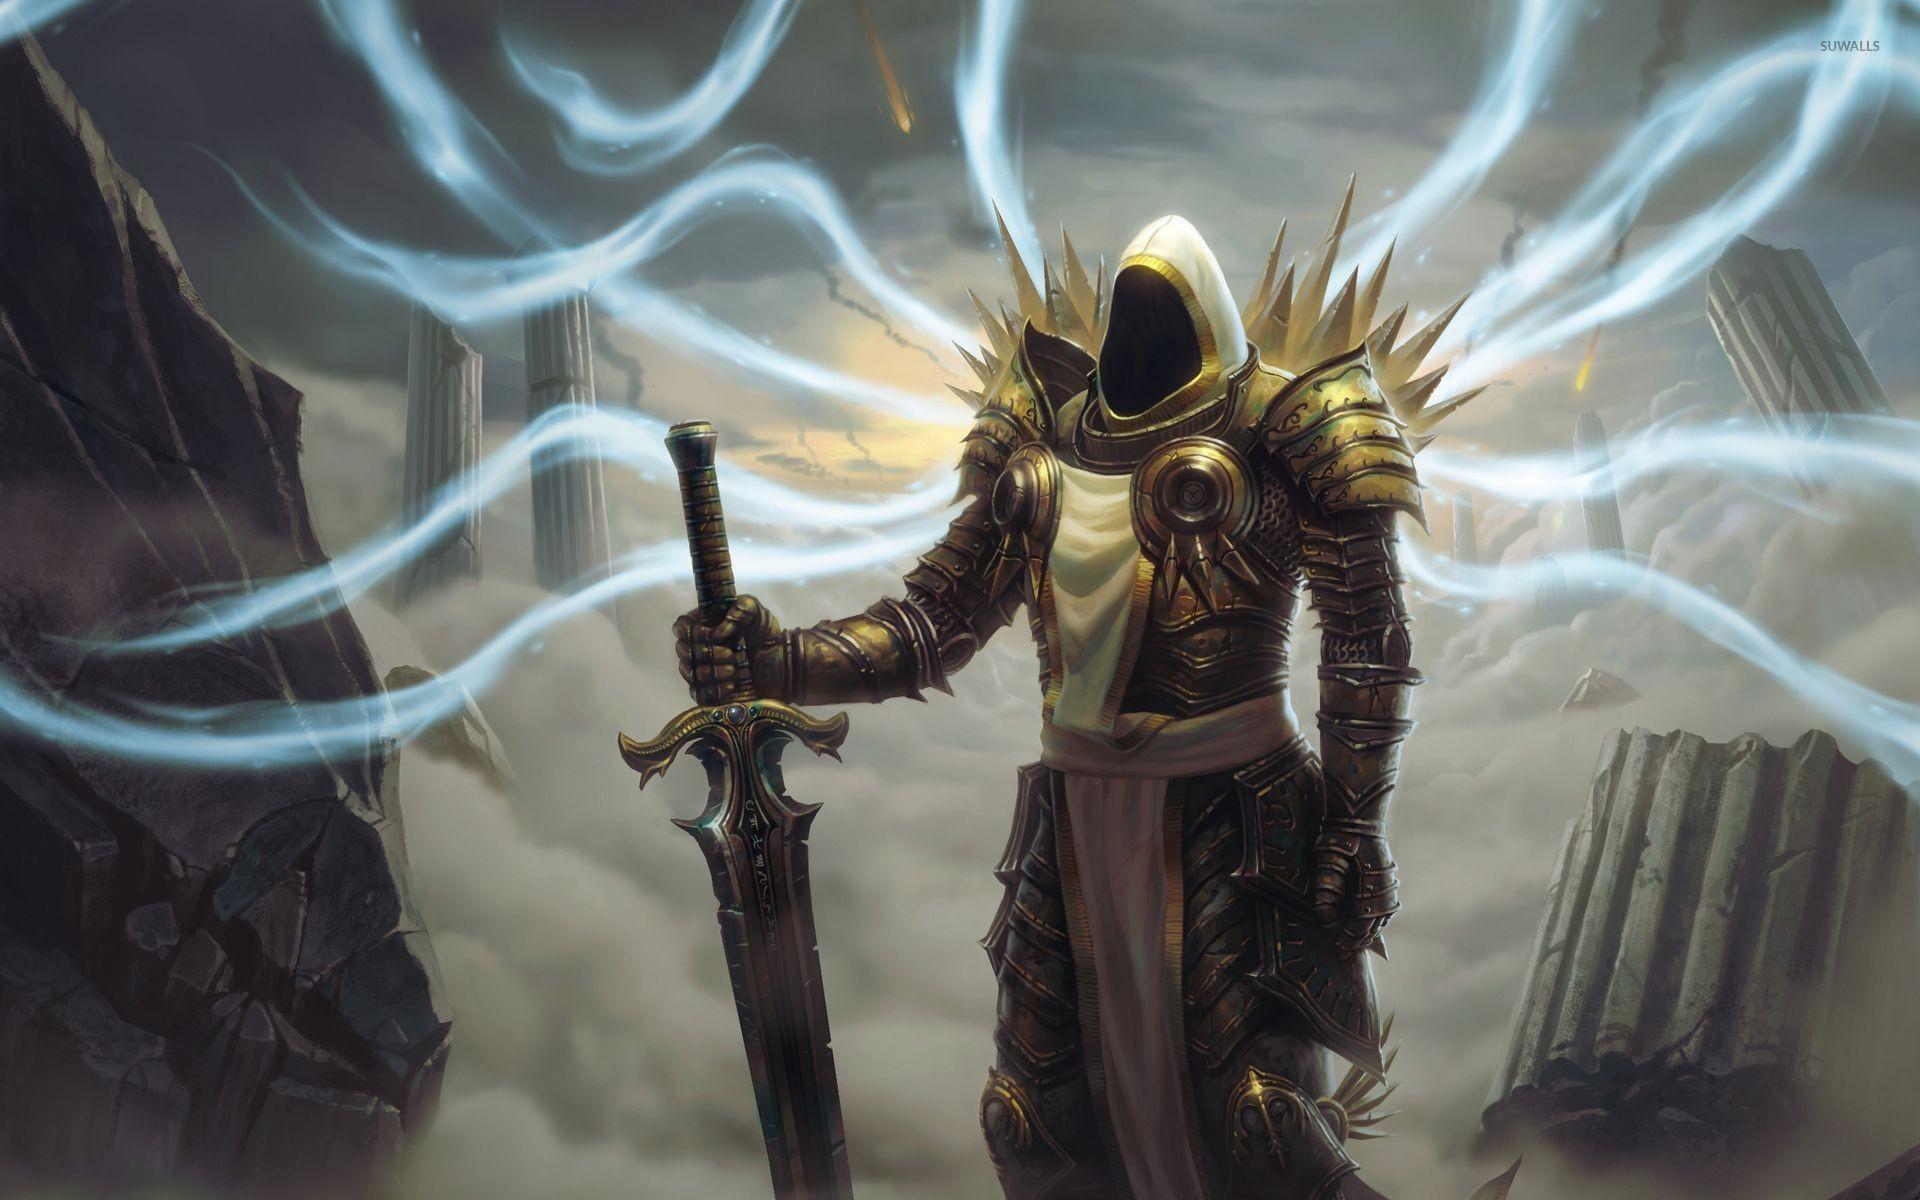 Res: 1920x1200, Tyrael with a golden sword - Diablo wallpaper